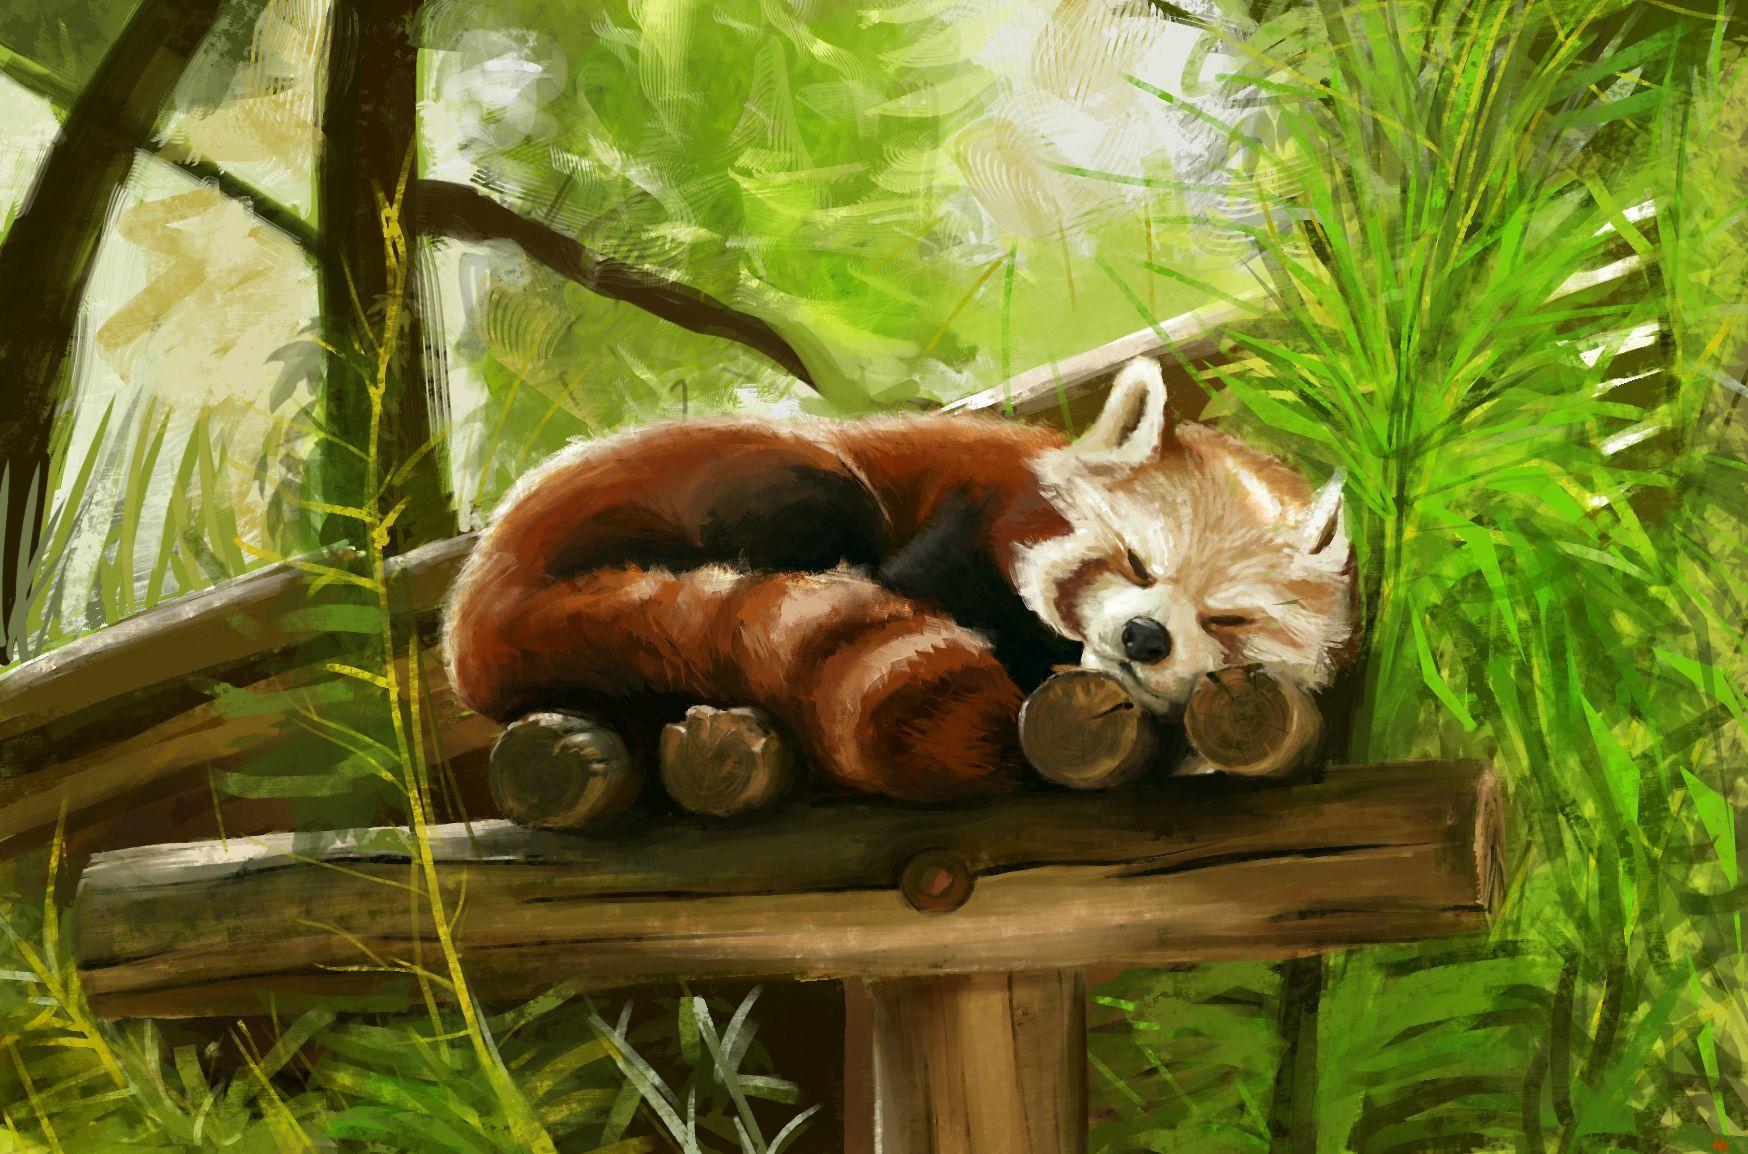 I Painted A Red Panda Post Red Panda Panda Background Panda Art Wallpaper red panda trunk tree nature